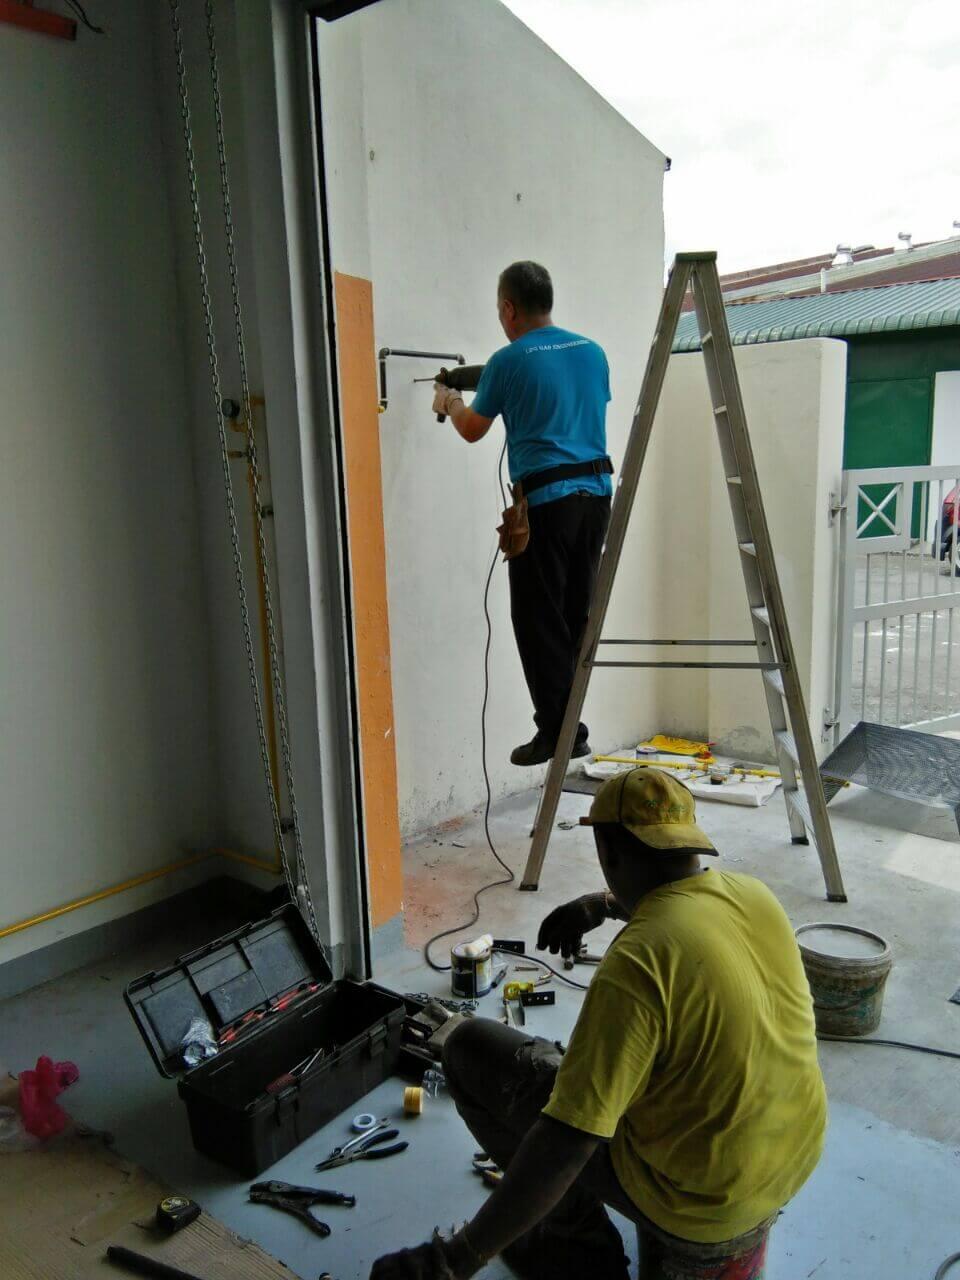 Gas Range Installation Service : Gas stove repair service install in kl pj selangor